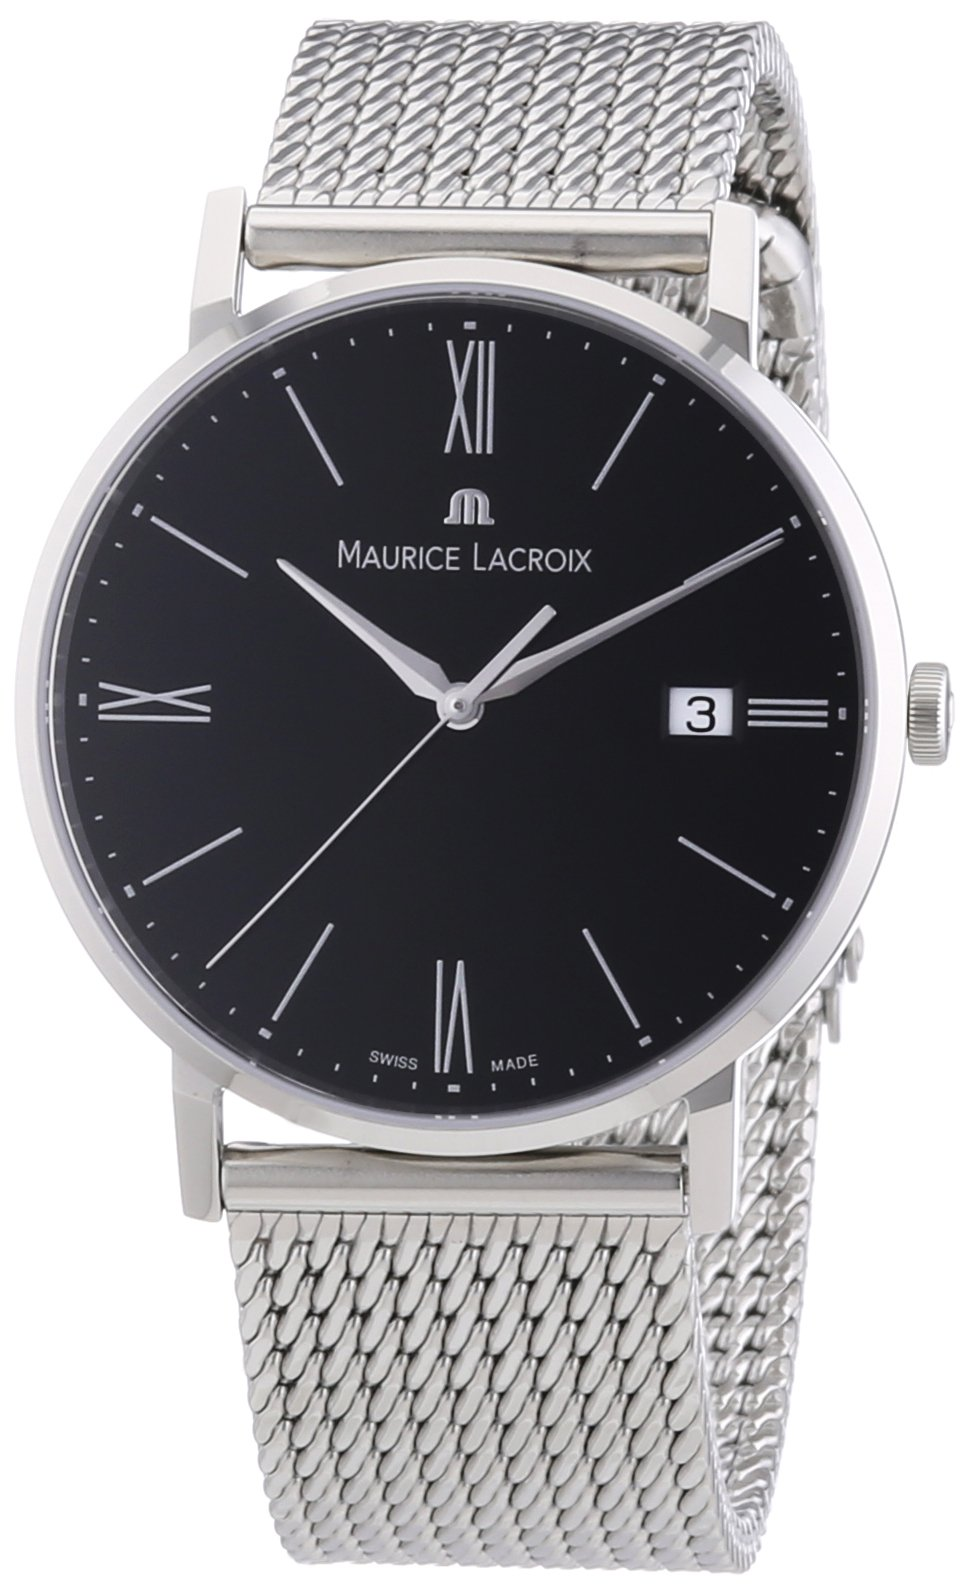 Maurice Lacroix Quarzuhren  Herren-Armbanduhr XL Eliros Analog Quarz Edelstahl EL1087-SS002-310